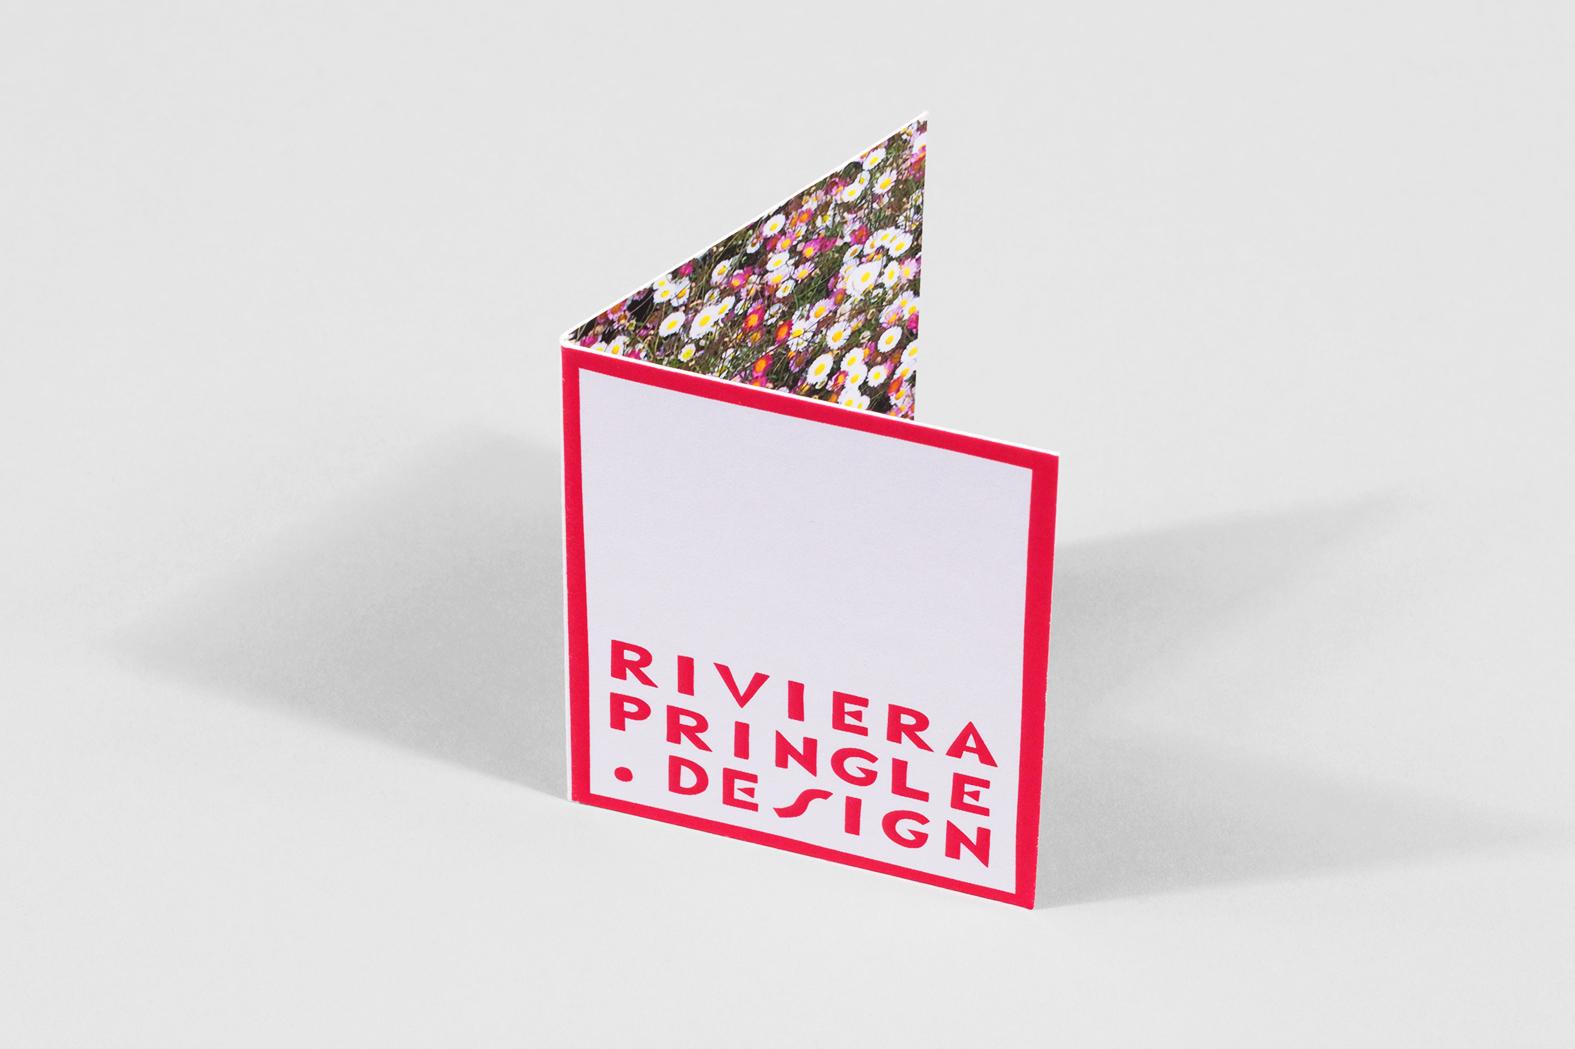 StudioEger_2018_RivieraPringle_WebReady3.jpg